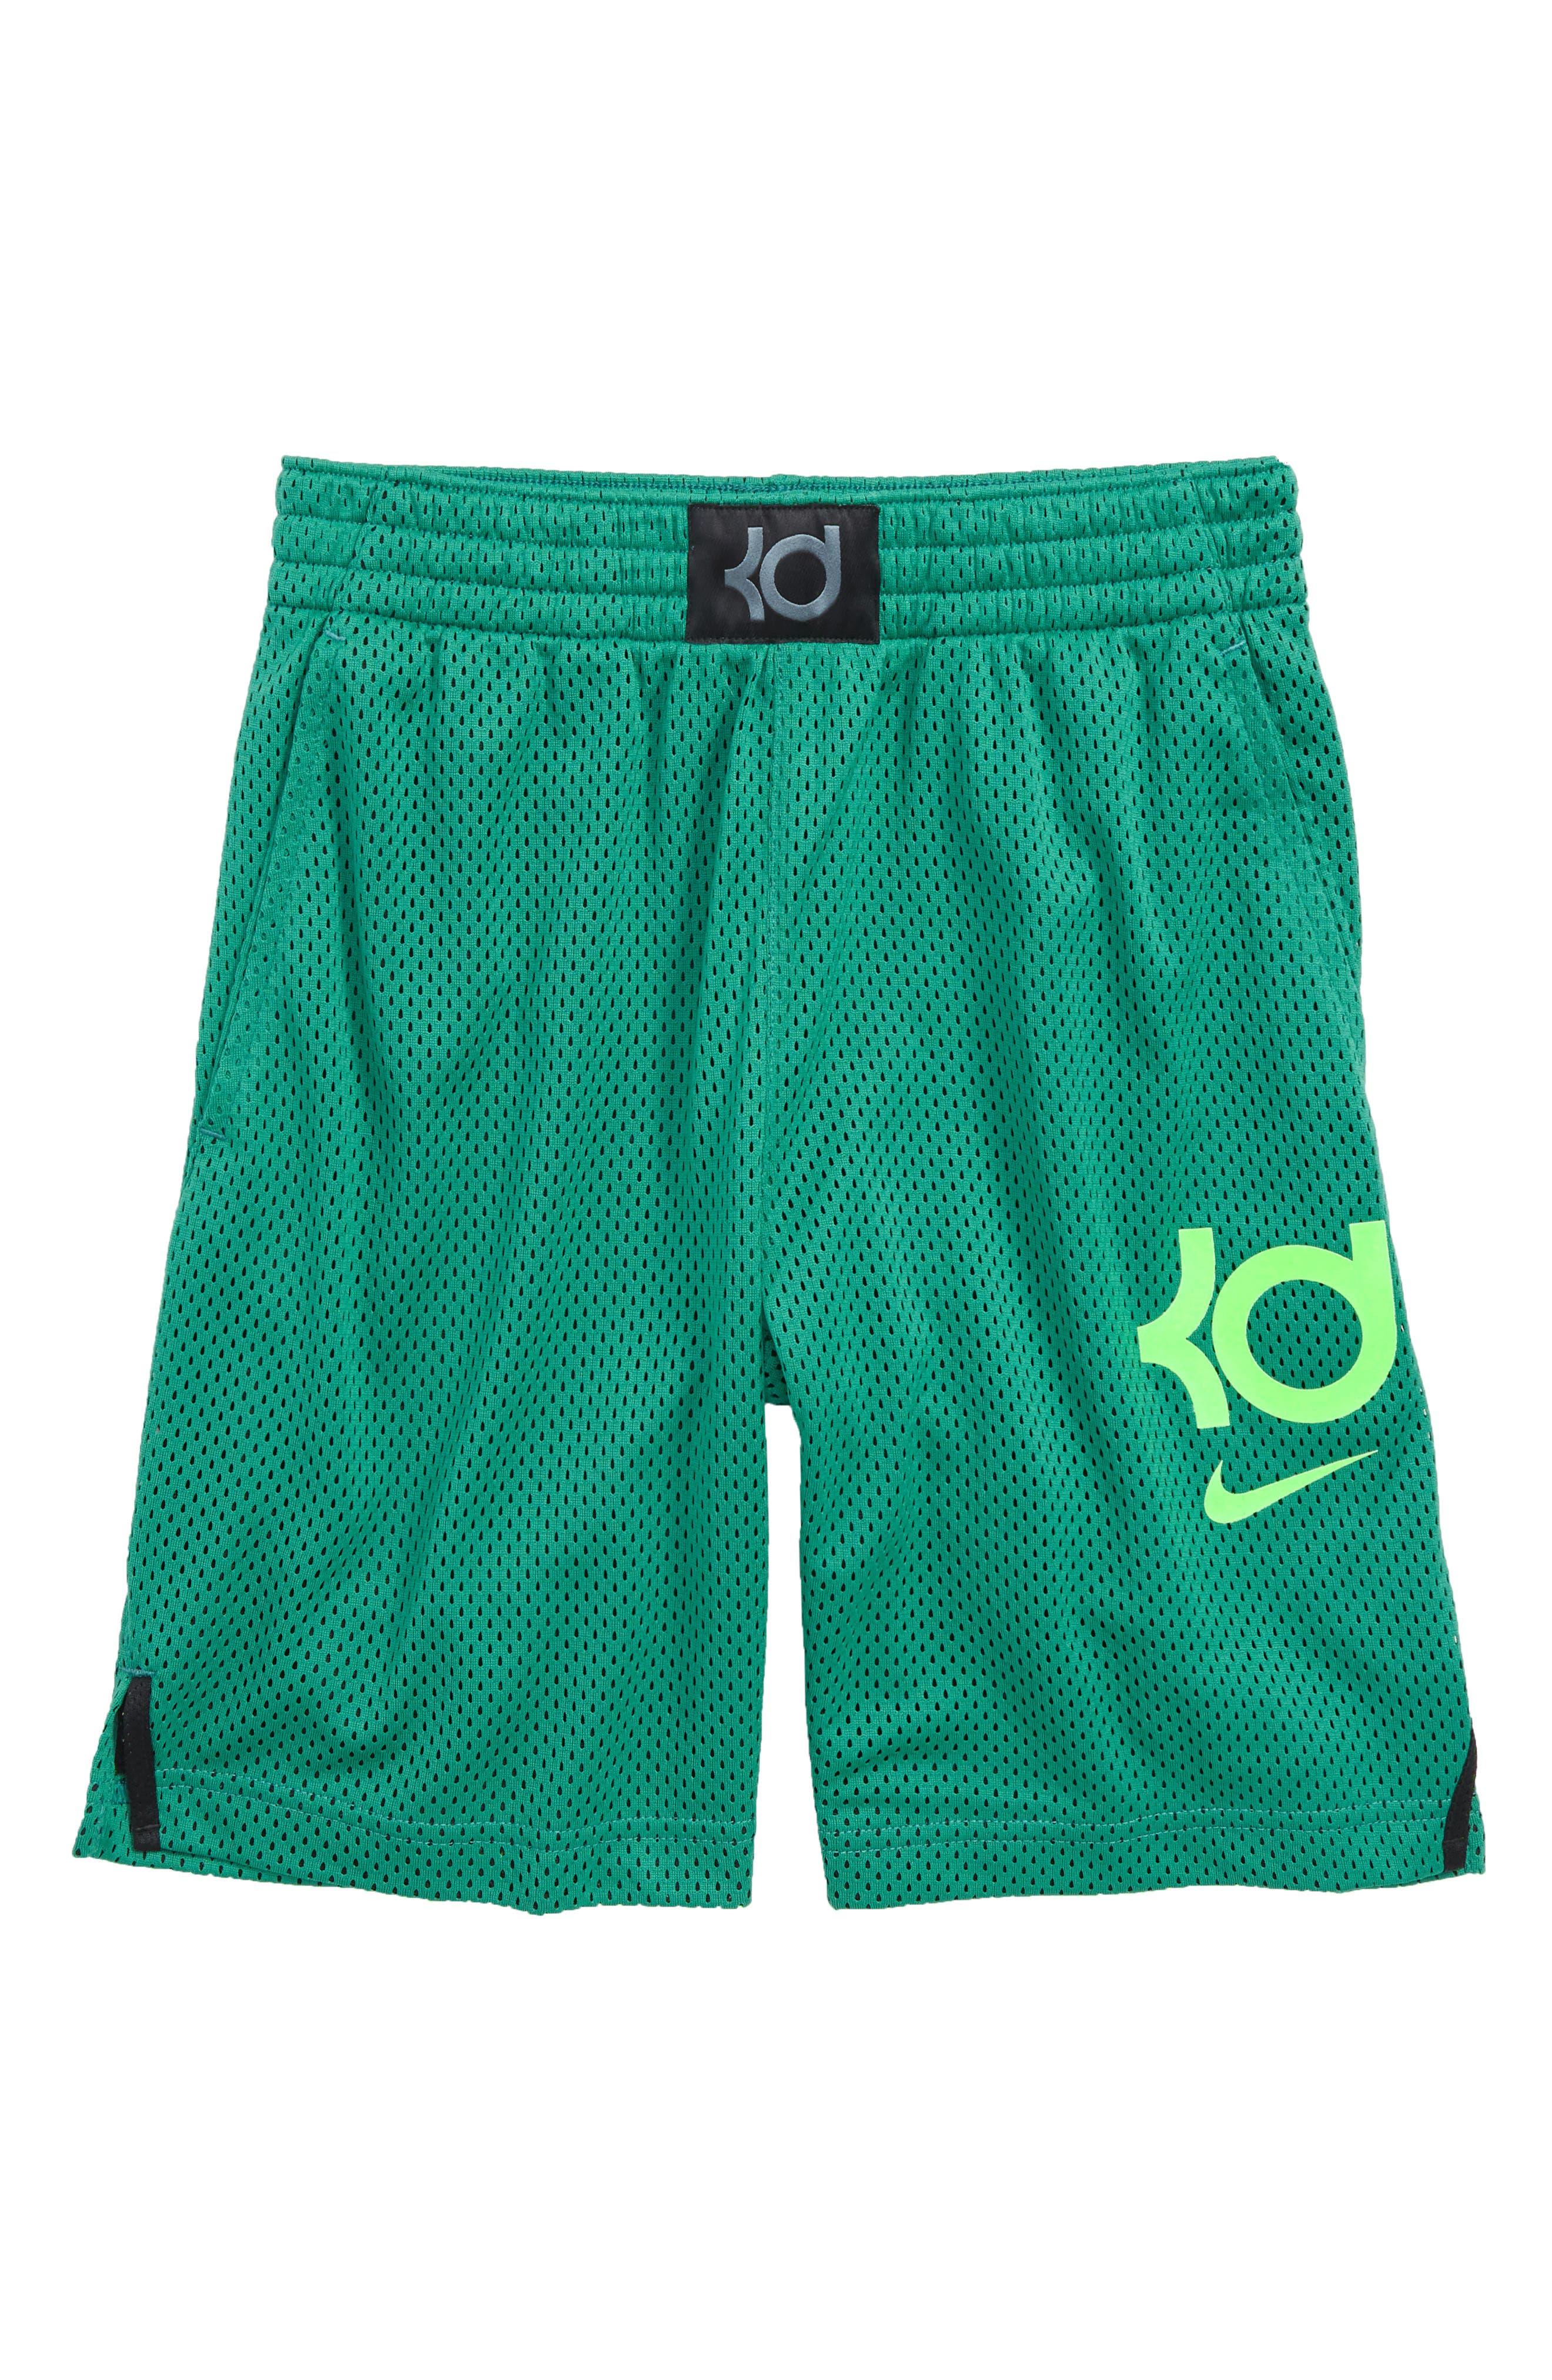 KD GFX Shorts,                             Main thumbnail 1, color,                             Green Noise/ Green Strike